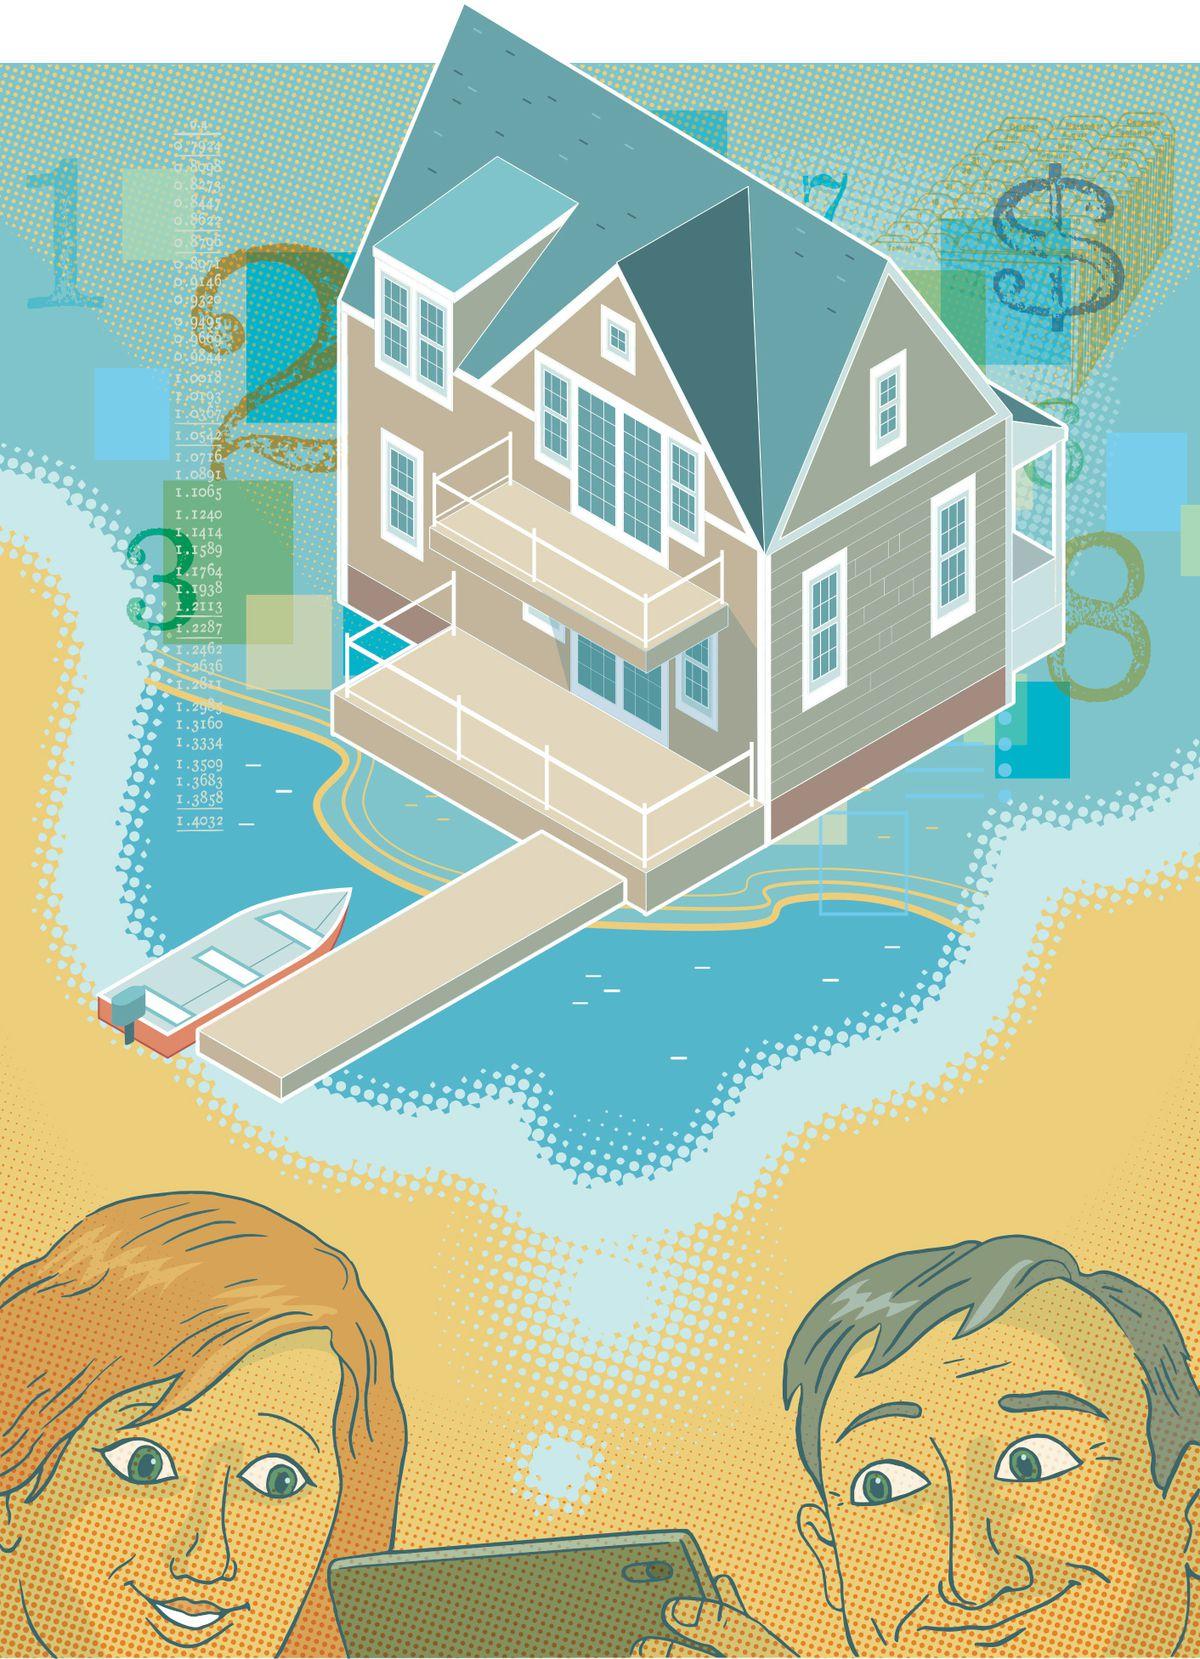 Summer 2021 Home Finances, beach house illustration